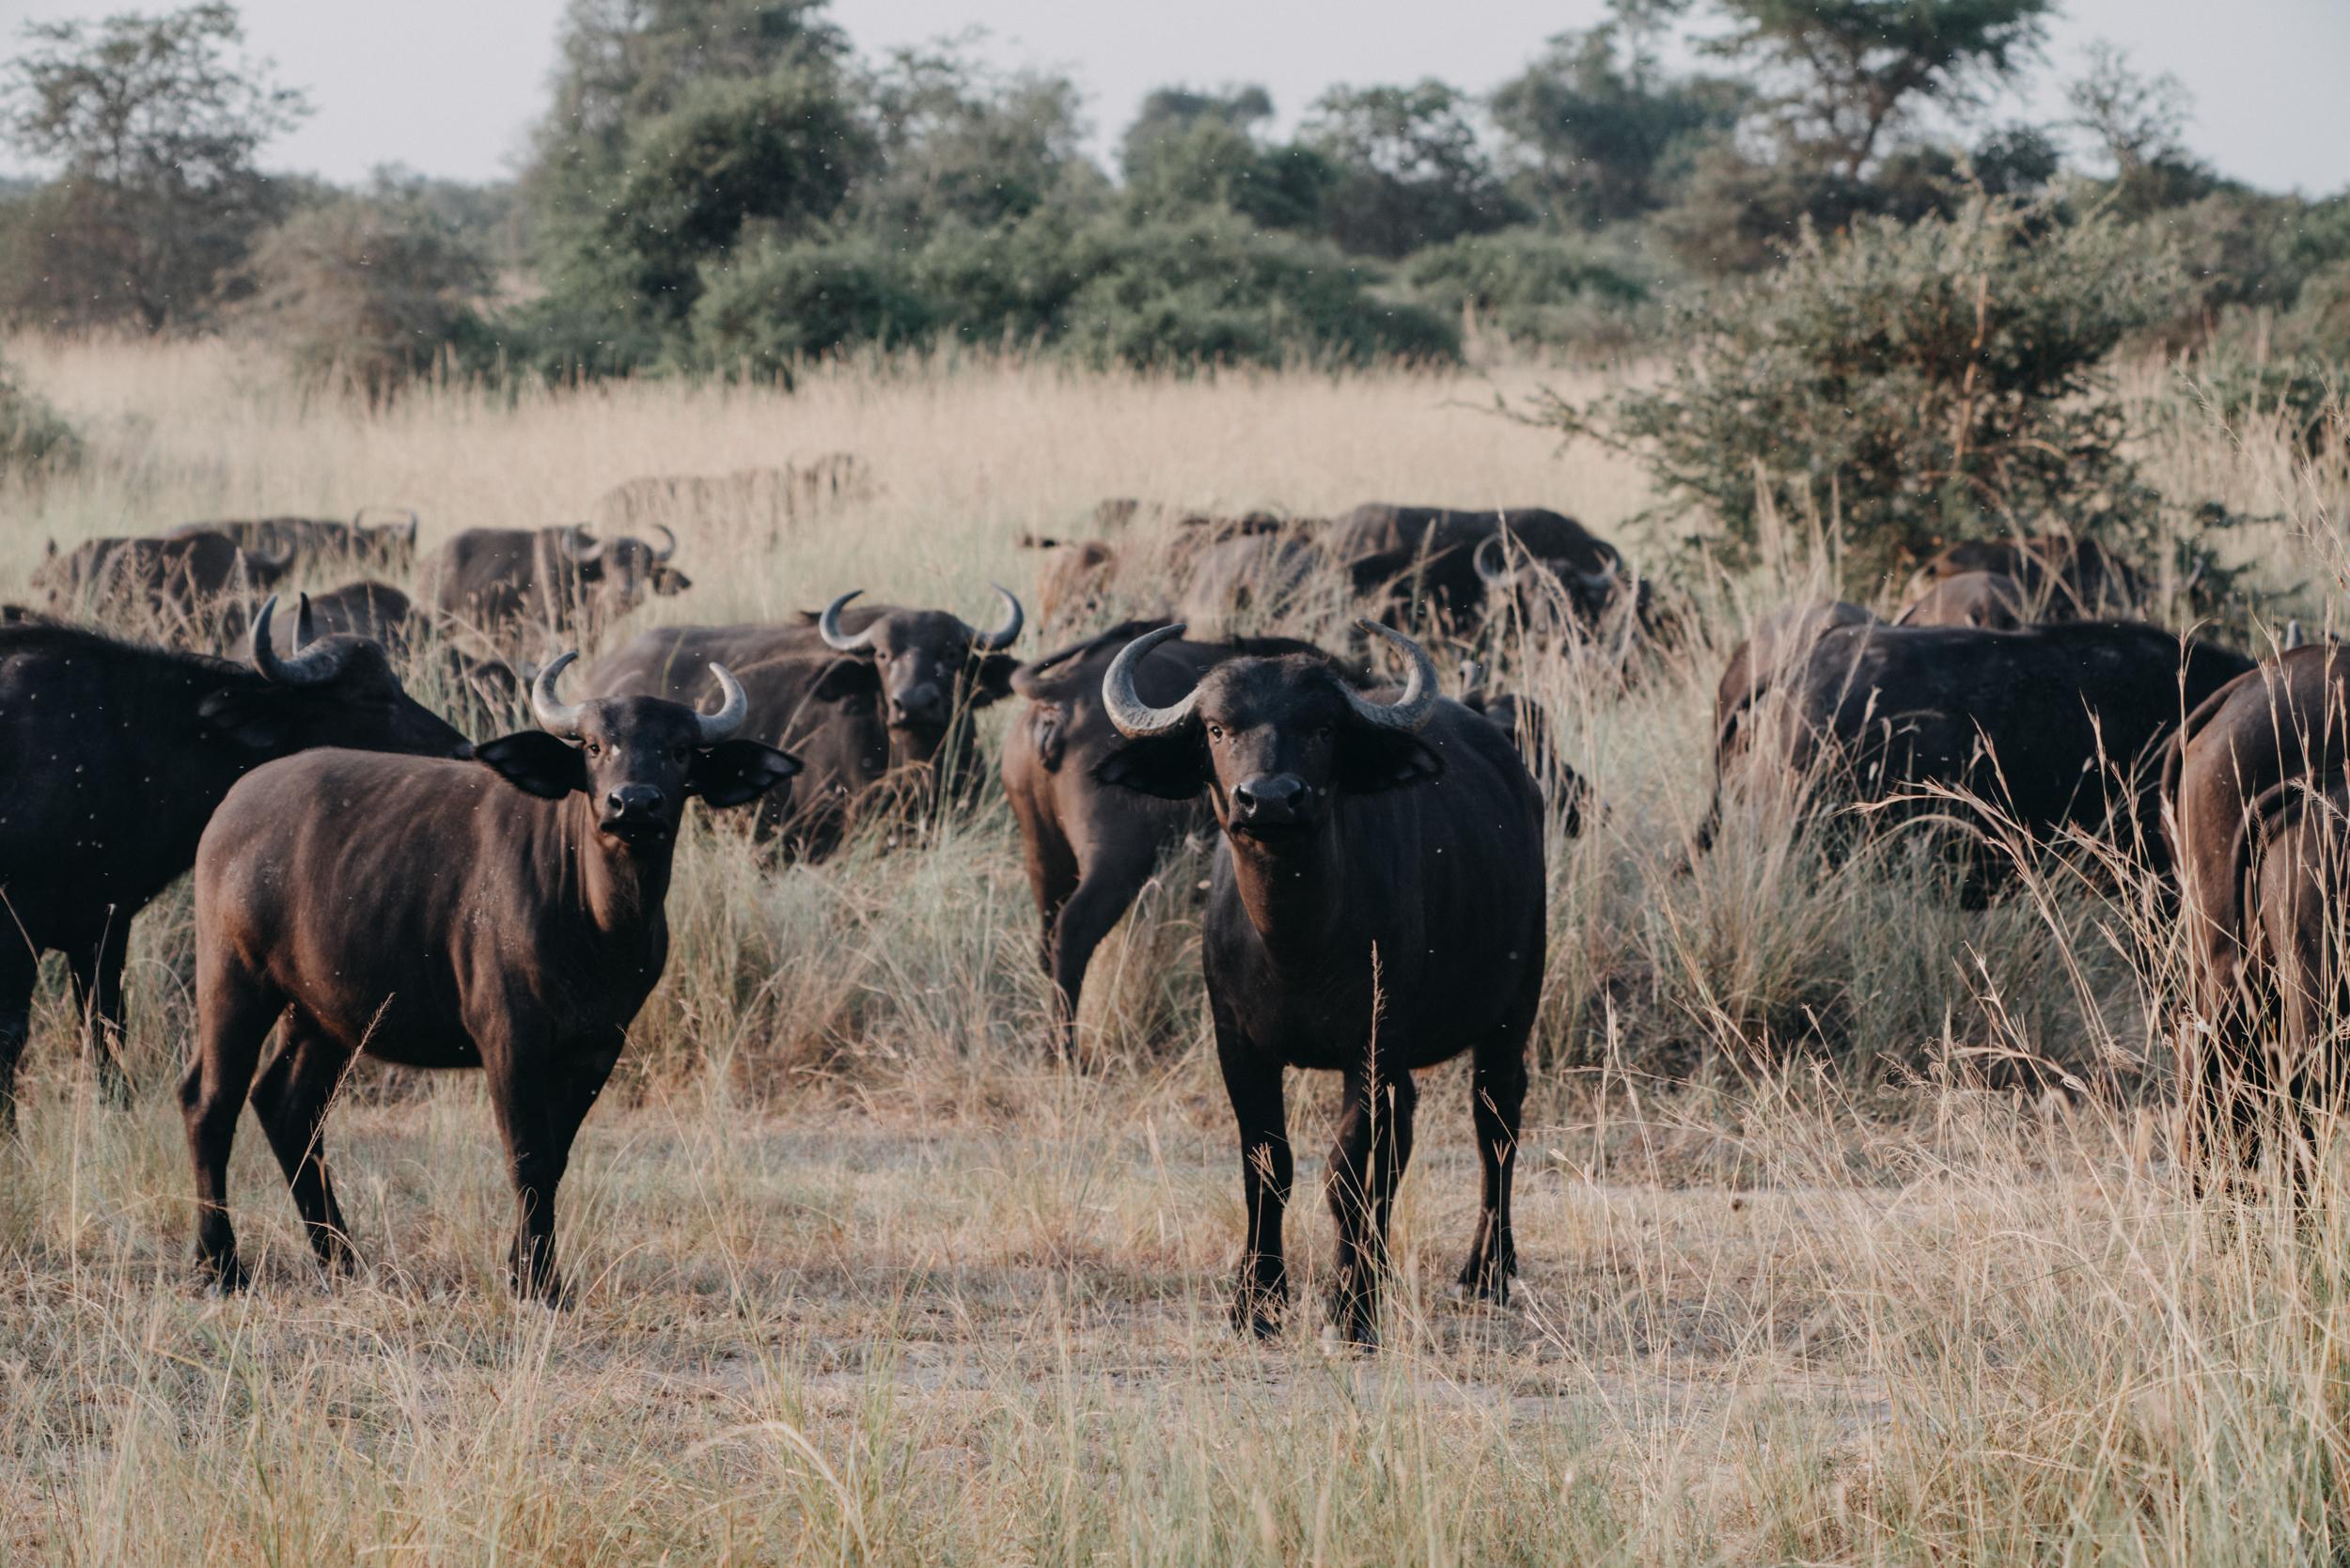 uganda july 2018-283.jpg